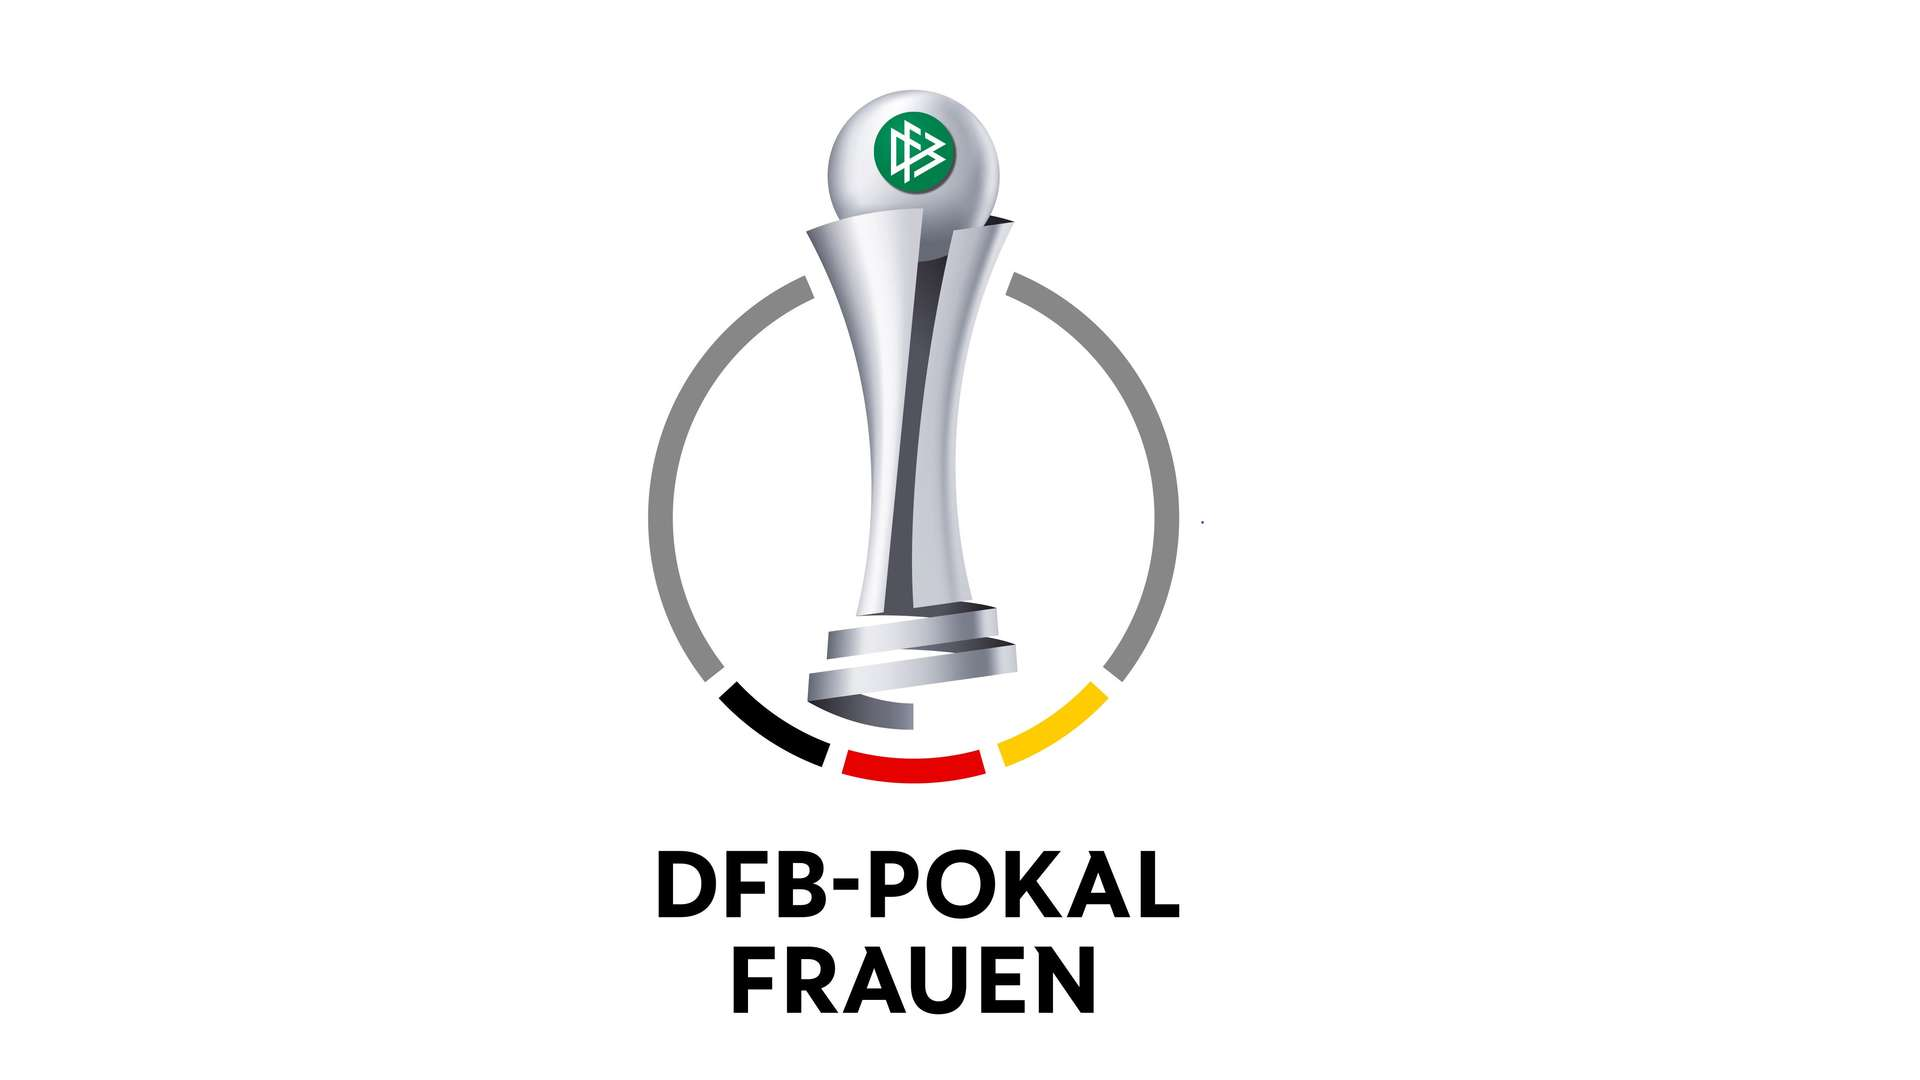 Dfb Frauen Pokal